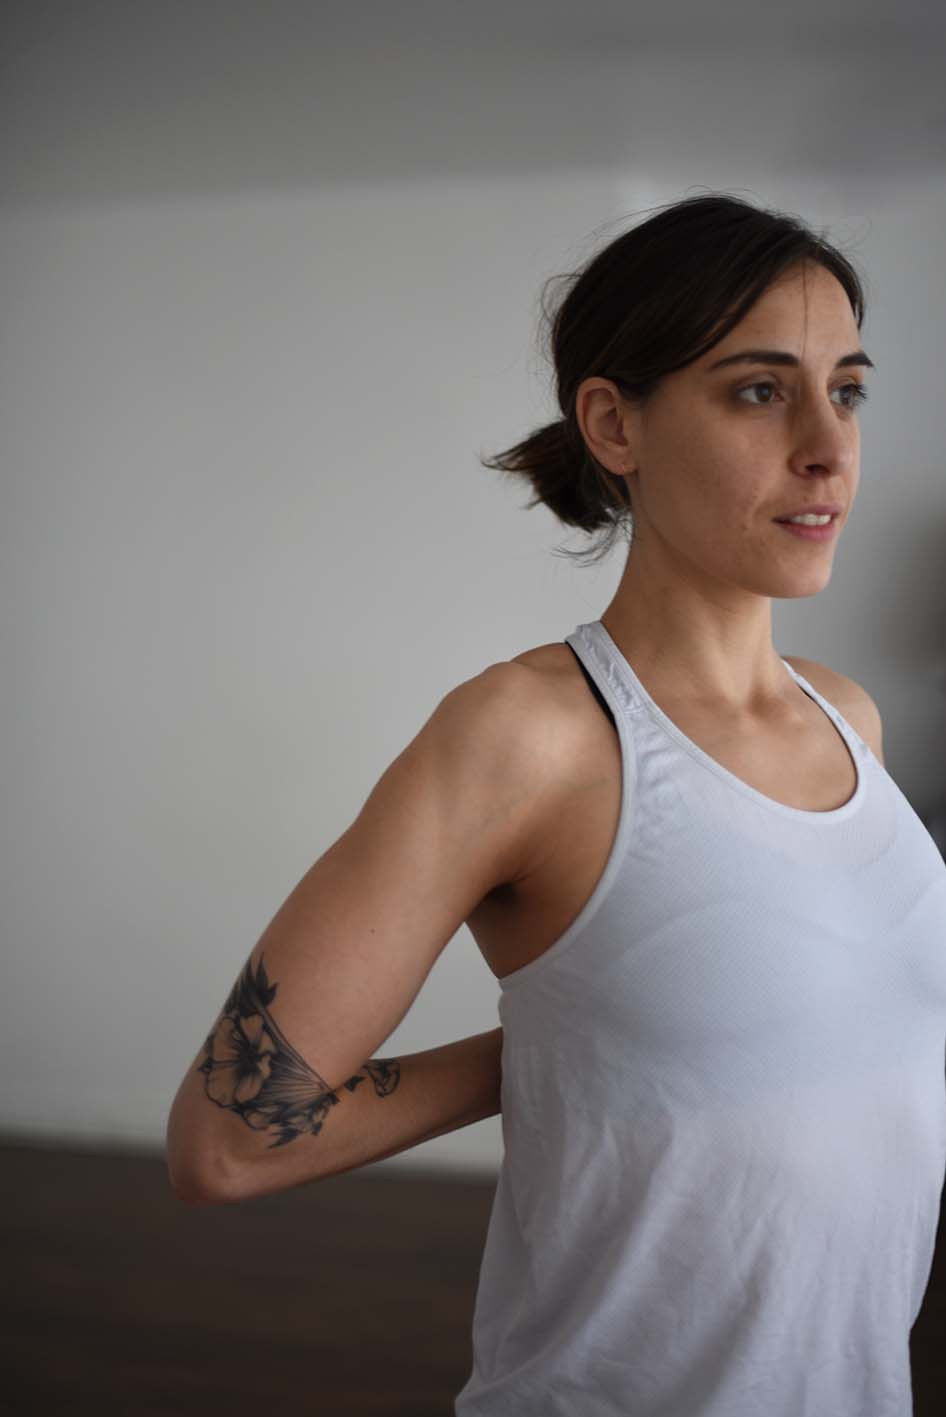 Professeurs de yoga à Nantes